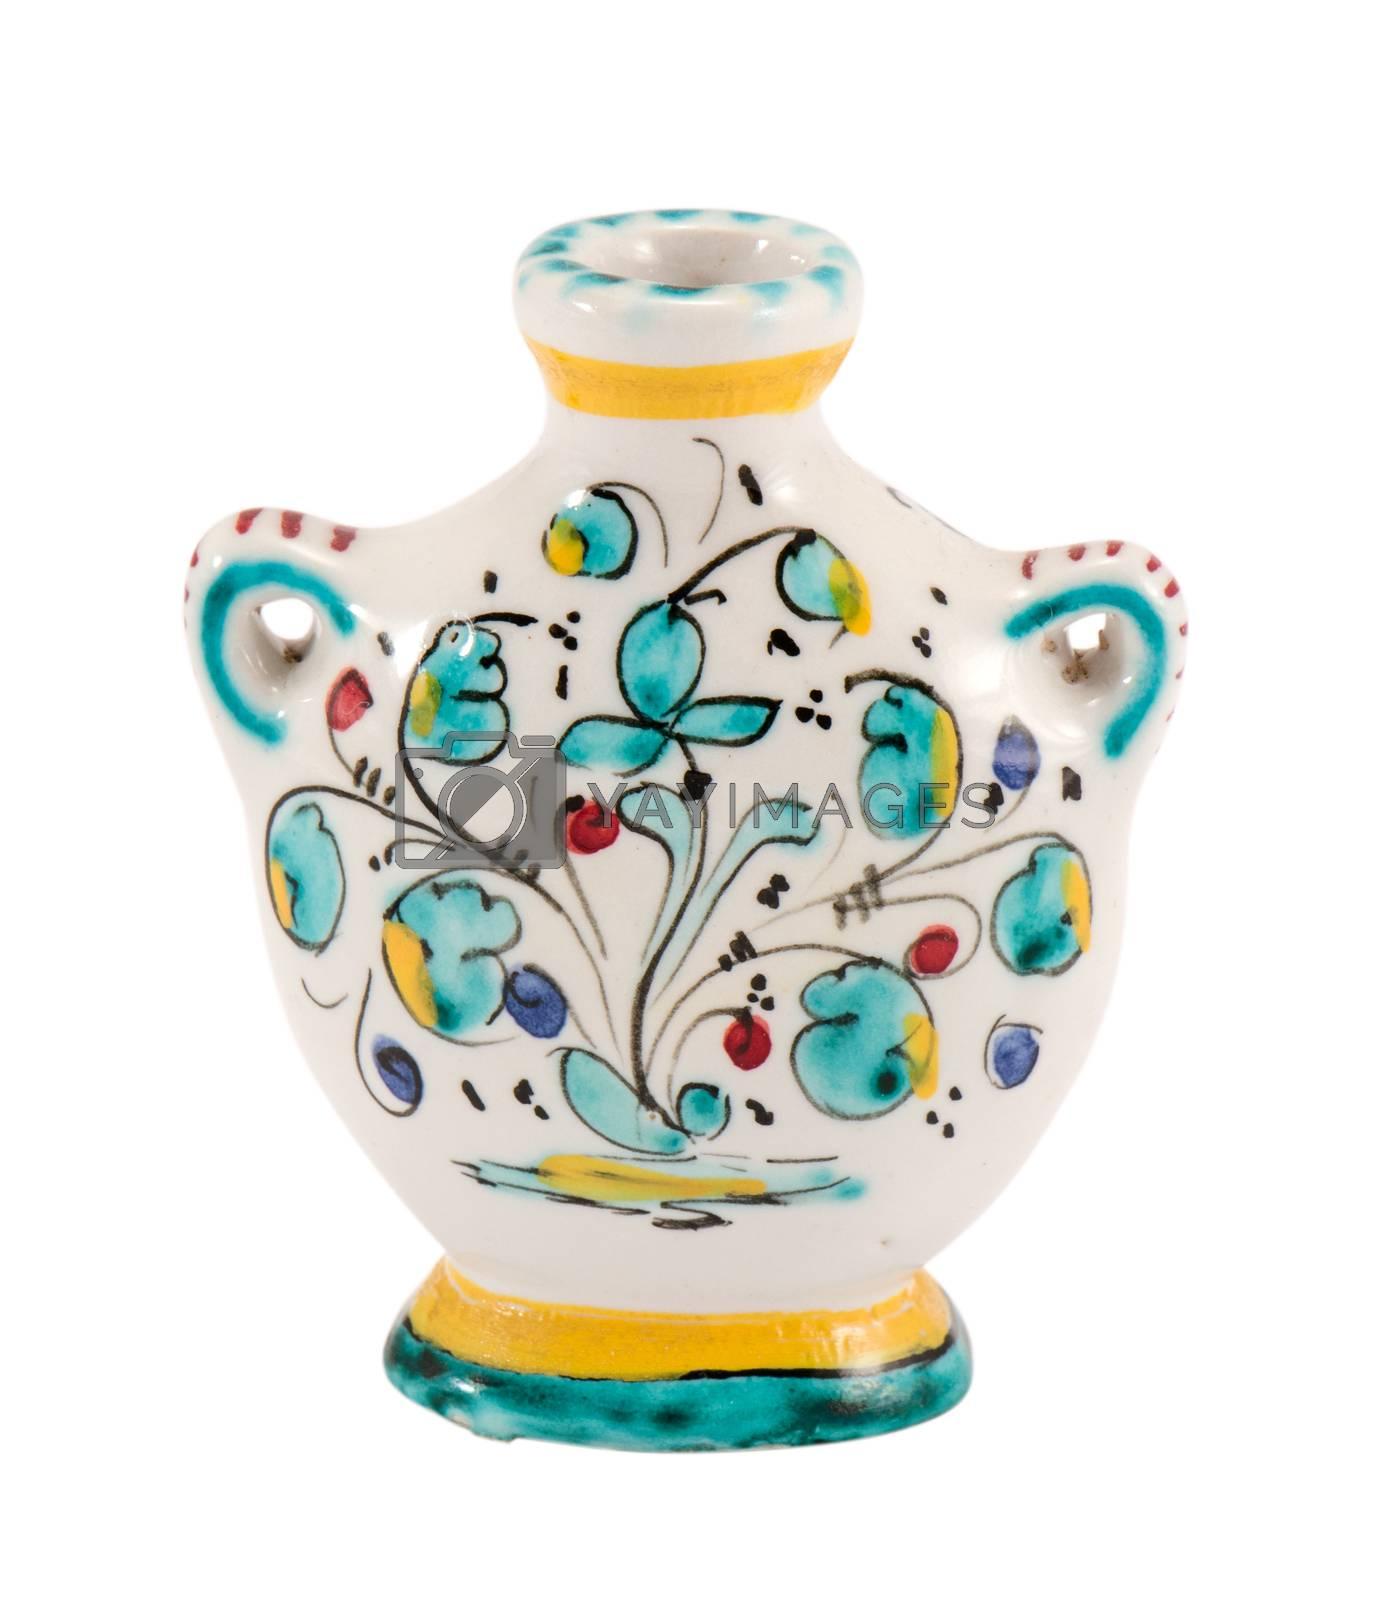 handmade ceramic flat vase with flower art paintings isolated on white background.